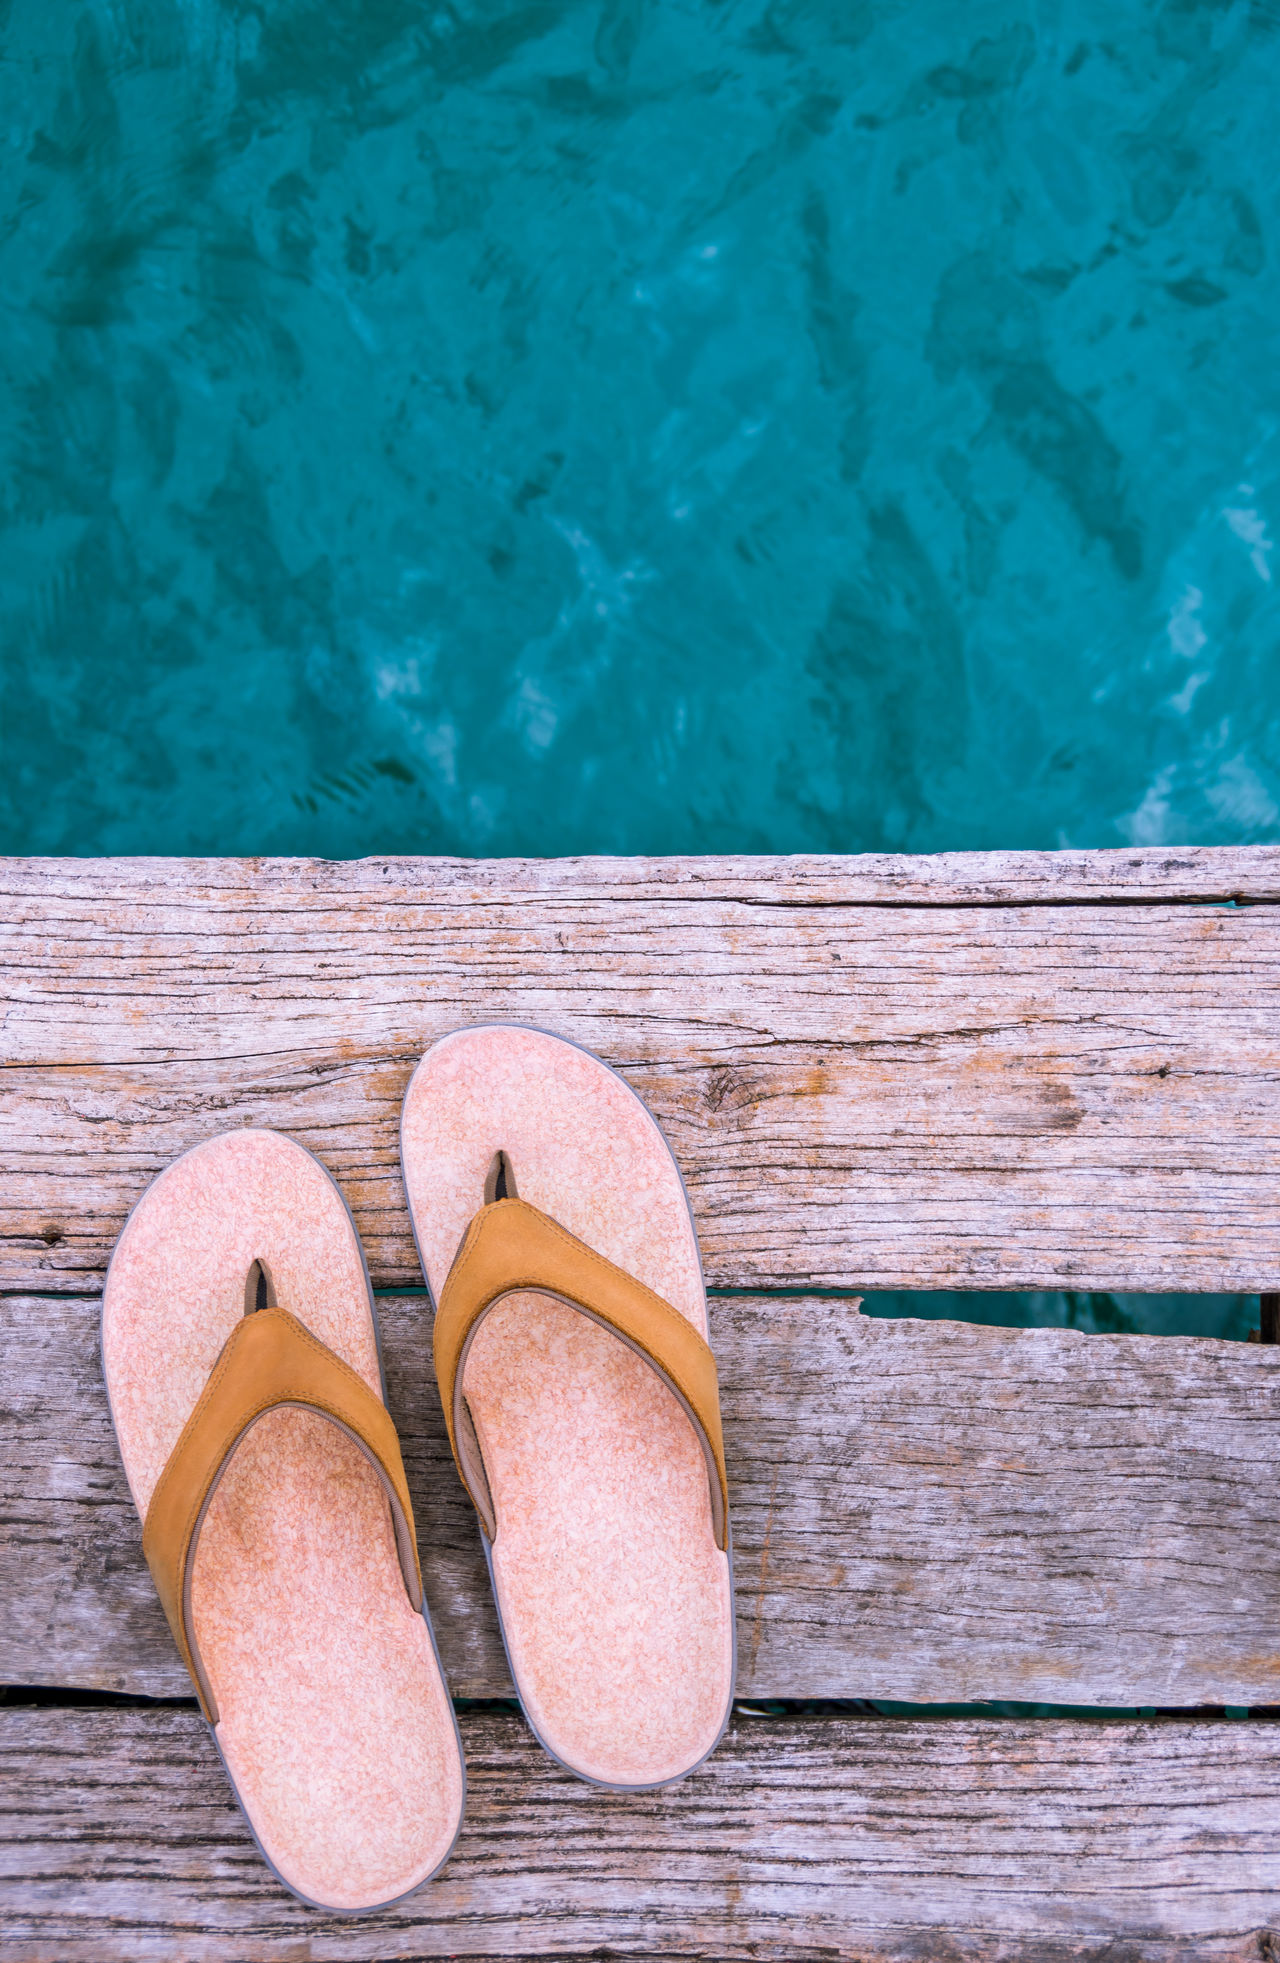 Pair of beige sandals on edge of wooden dock above turquoise water in Thailand. Adventure Aqua Beige Destination Dock Flip Flops Flip-flop Flipflops High Angle View Outdoors Pair Paradise Sandals Summer Summer Vibes Summertime Swim Swimming Tan Tropical Turquoise Vacation Time Vacations Water Wood